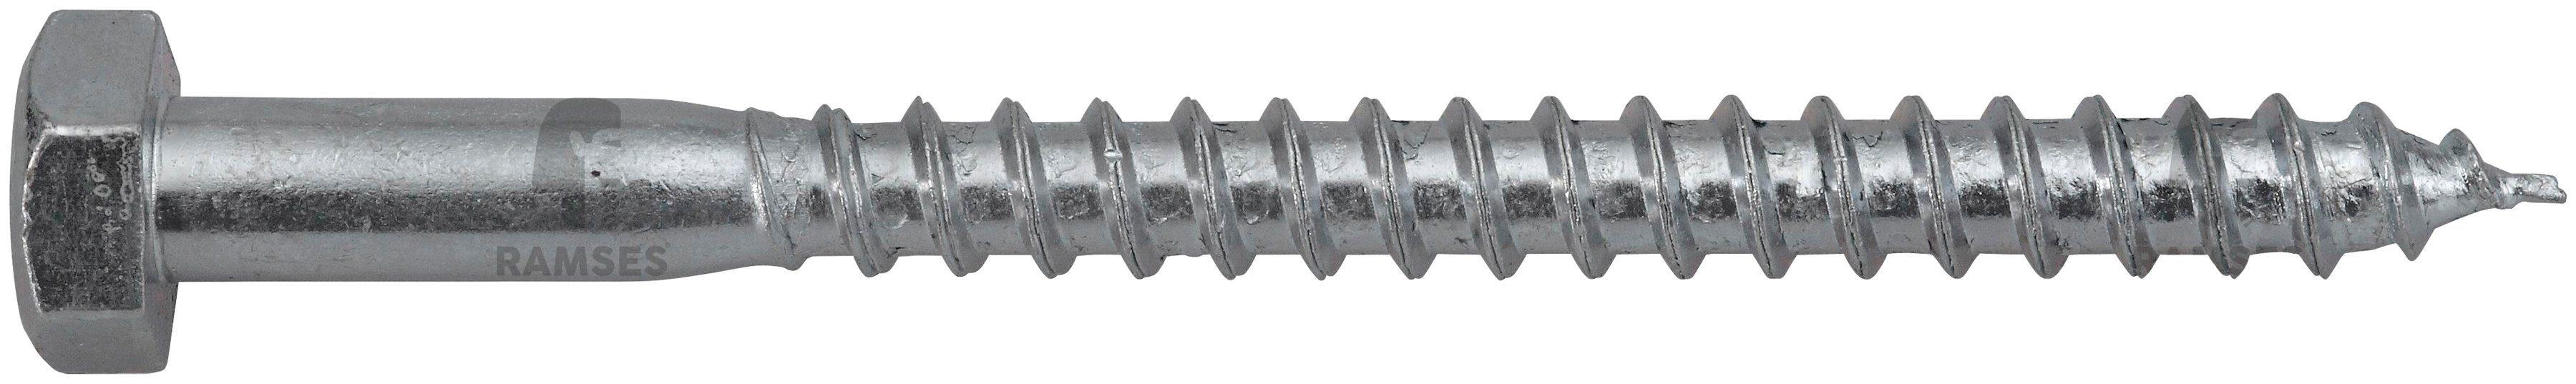 RAMSES Schrauben , Sechskant-Holzschraube 12 x 80 mm 50 Stk.